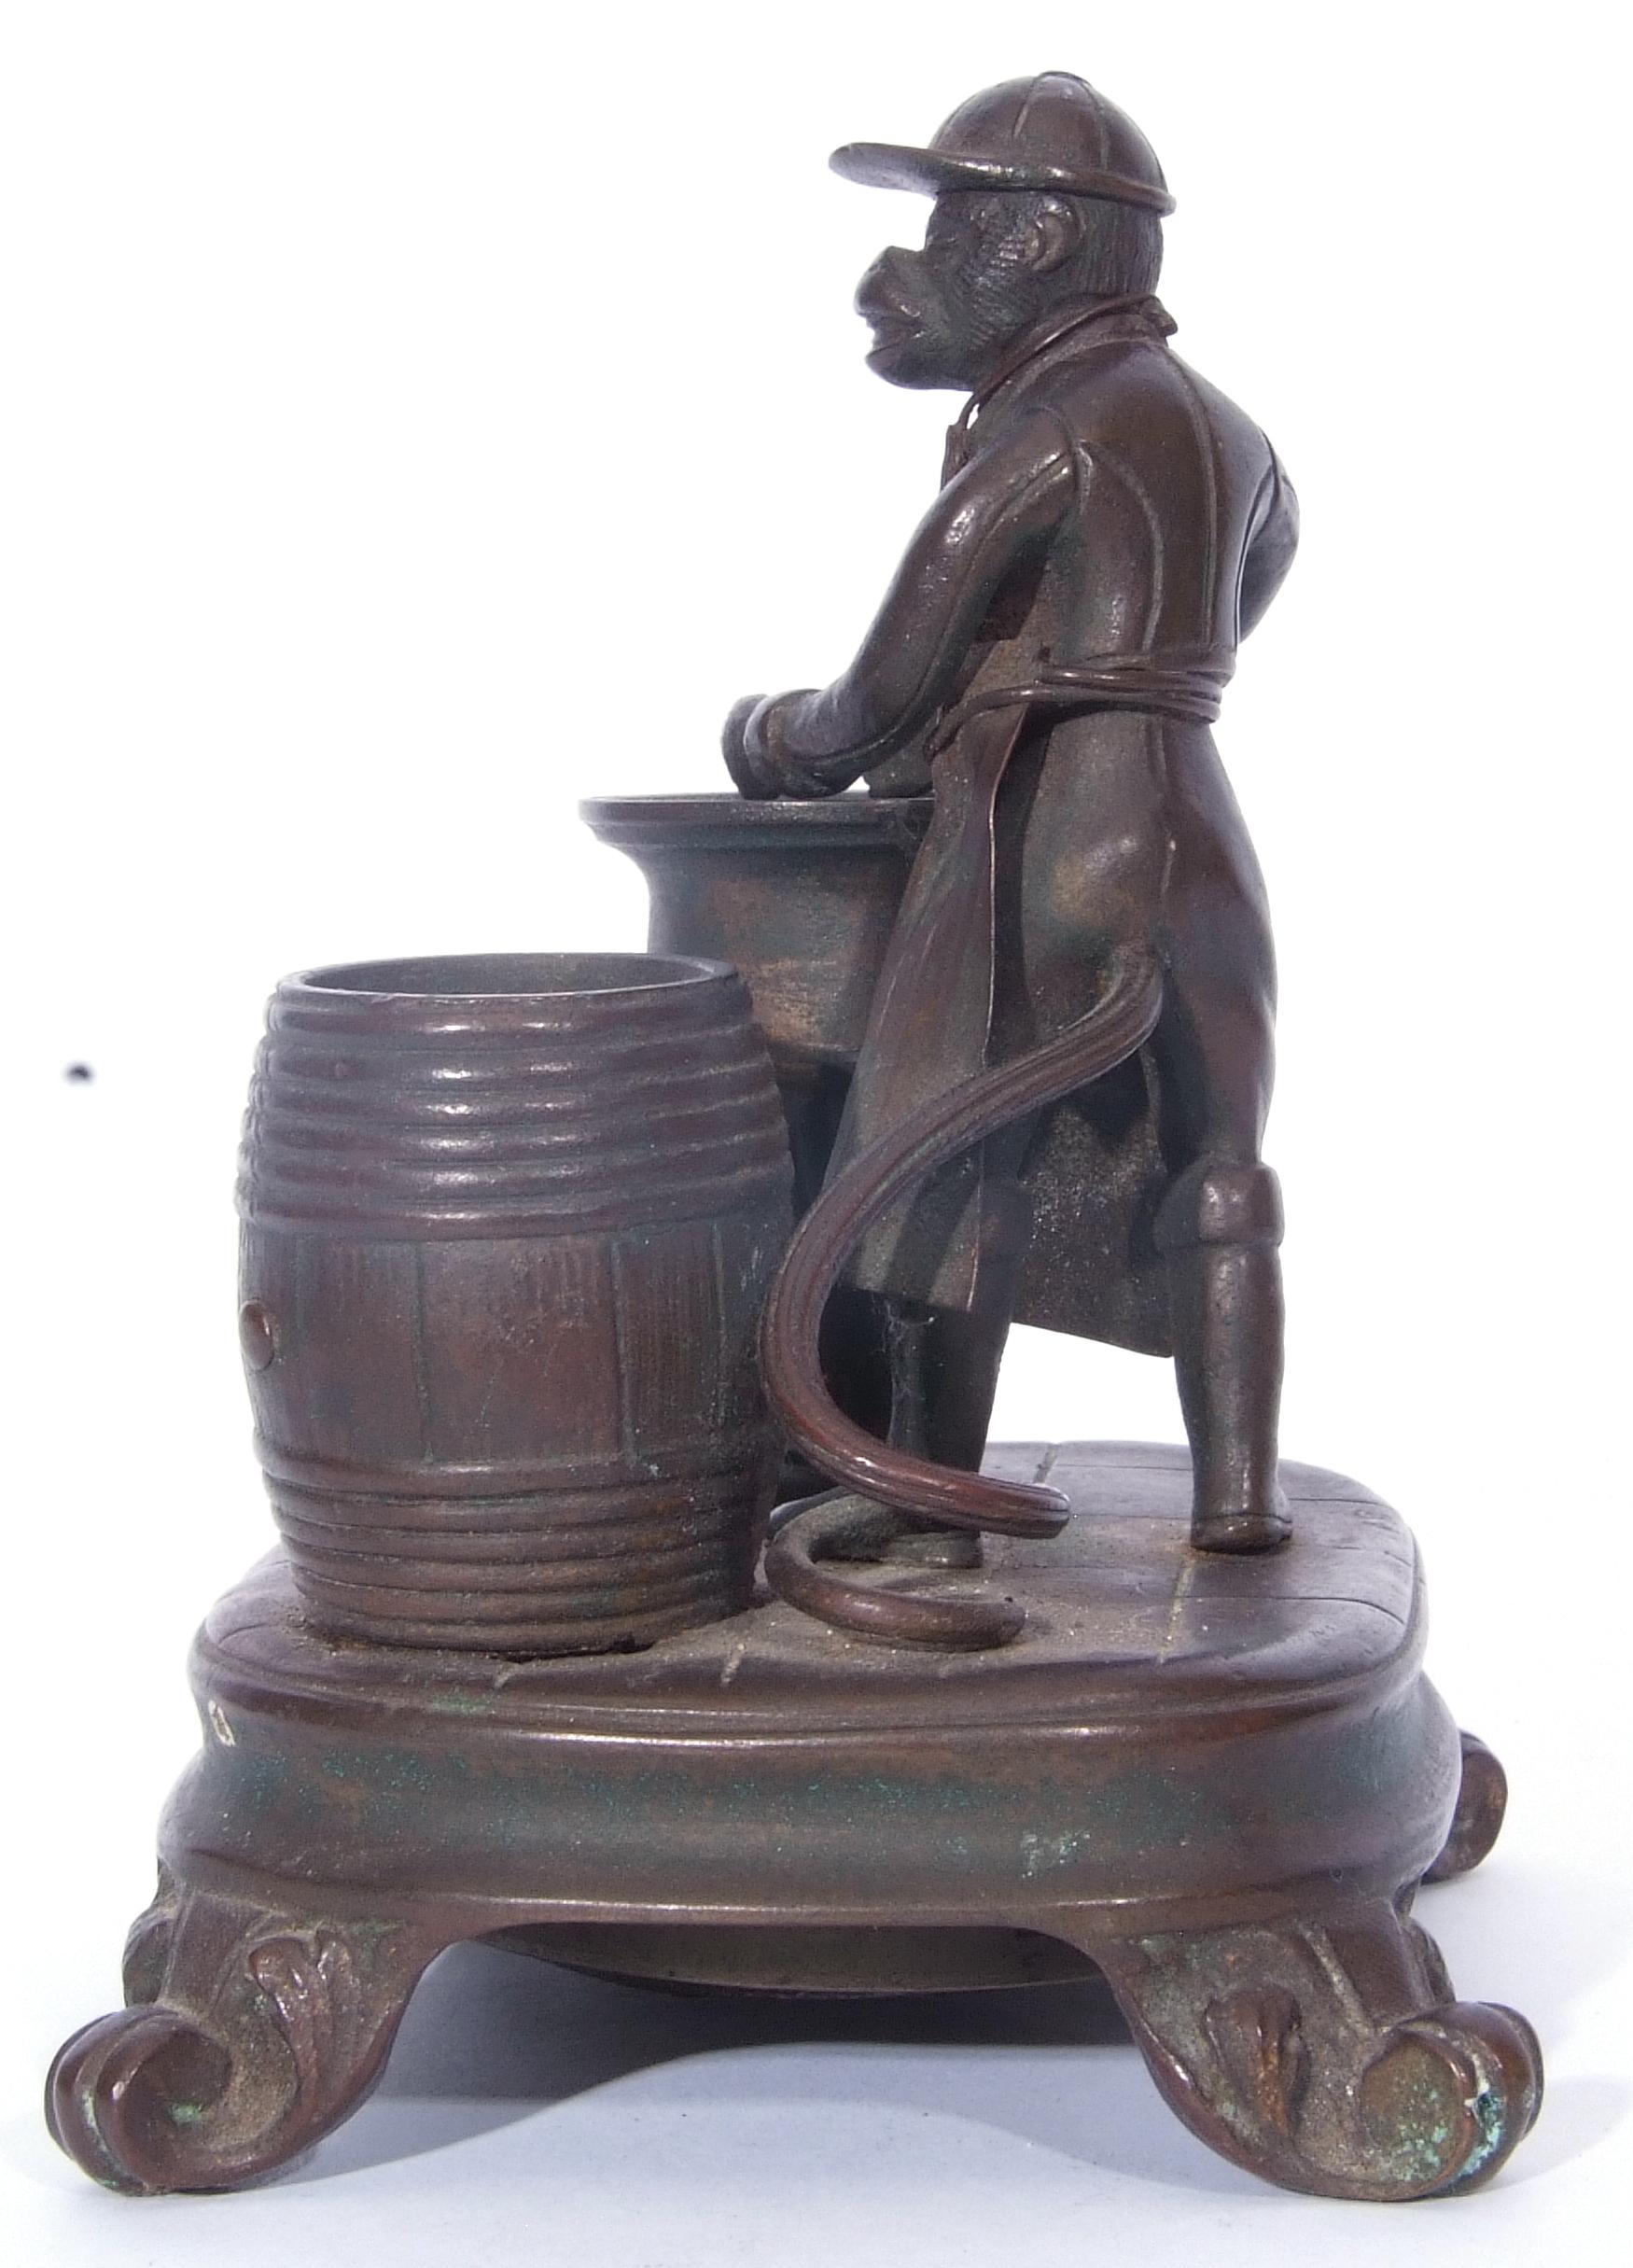 Antique bronze desk bell, a model of a monkey - Image 6 of 11